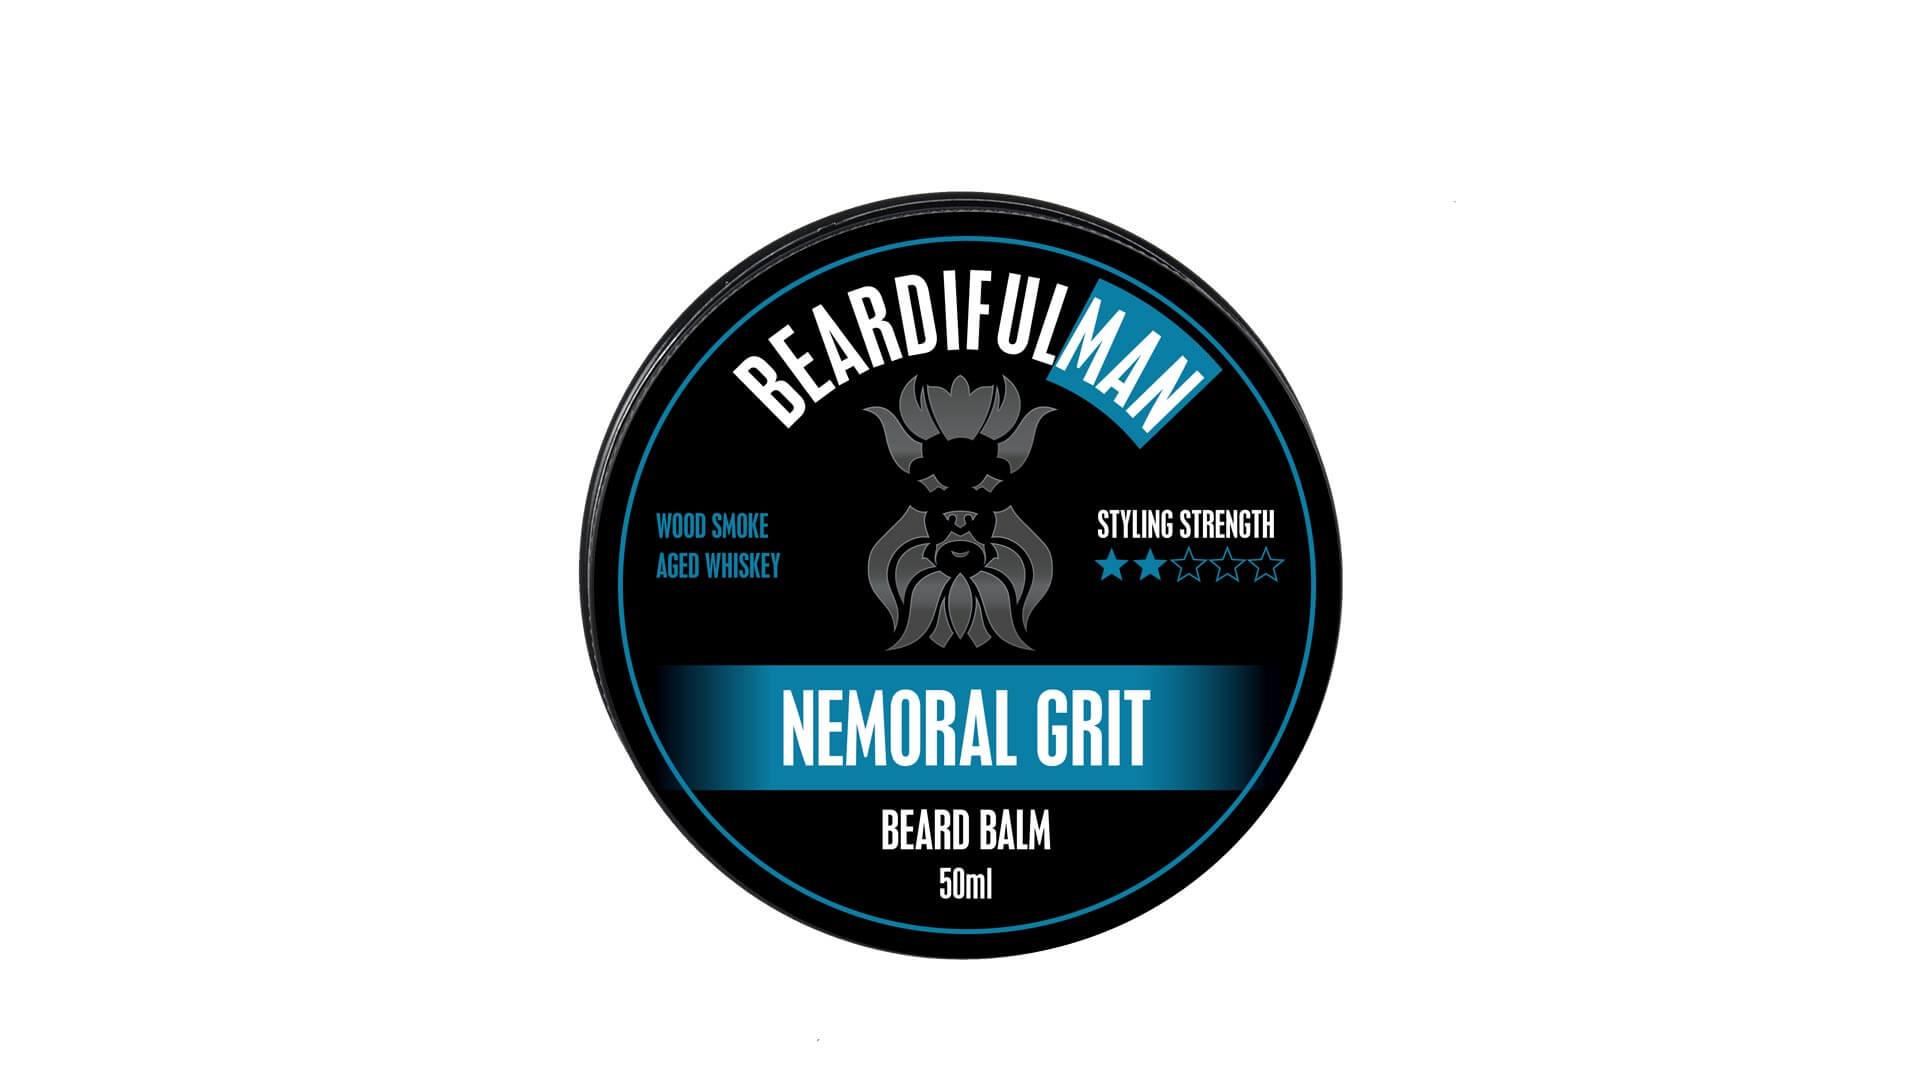 Single 50ml tin of Nemoral Grit premium quality beard balm from Beardifulman